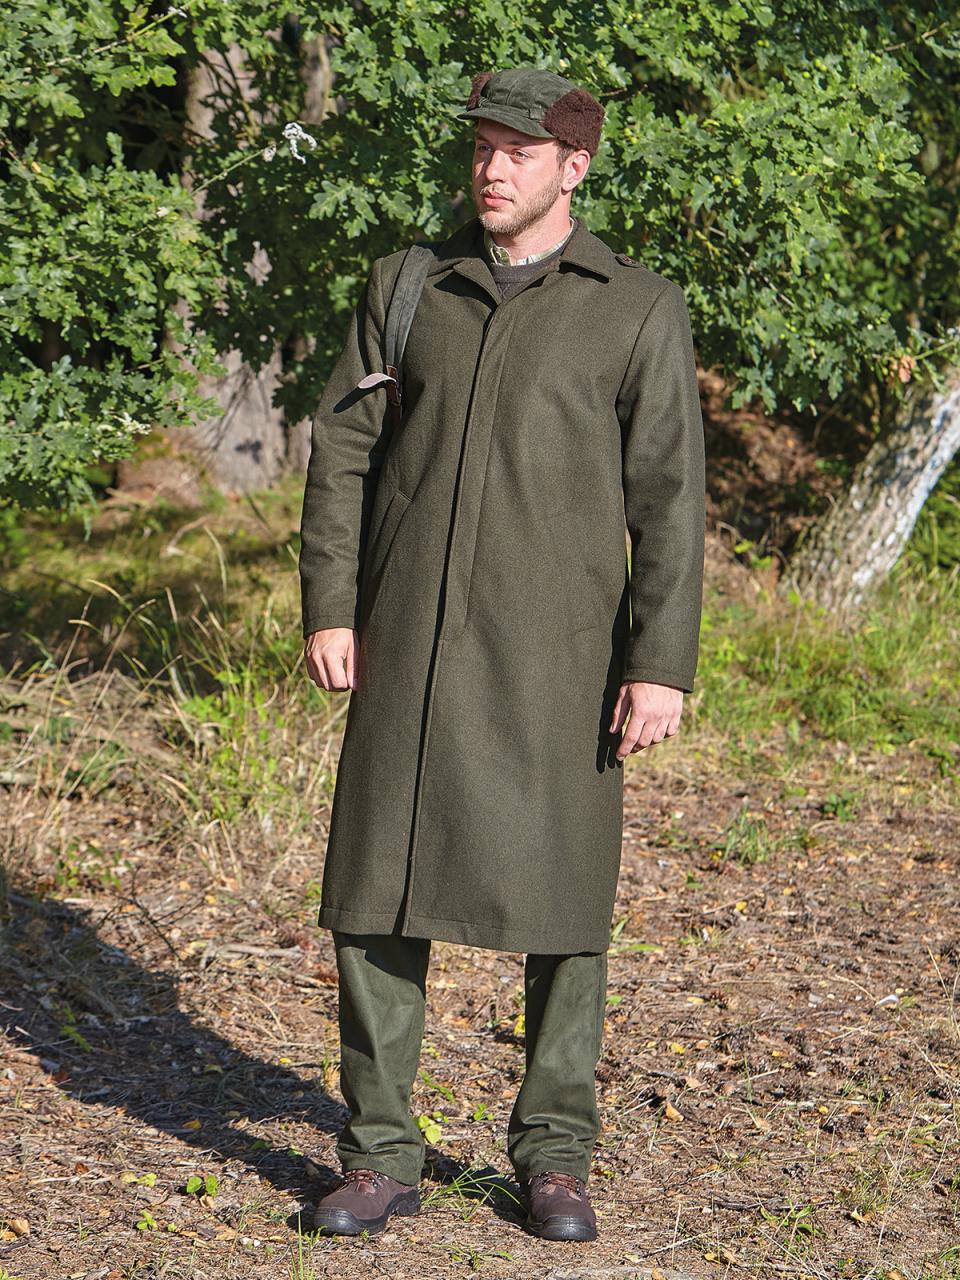 poľovnícky kabát HARALD outdoorové oblečenie ext